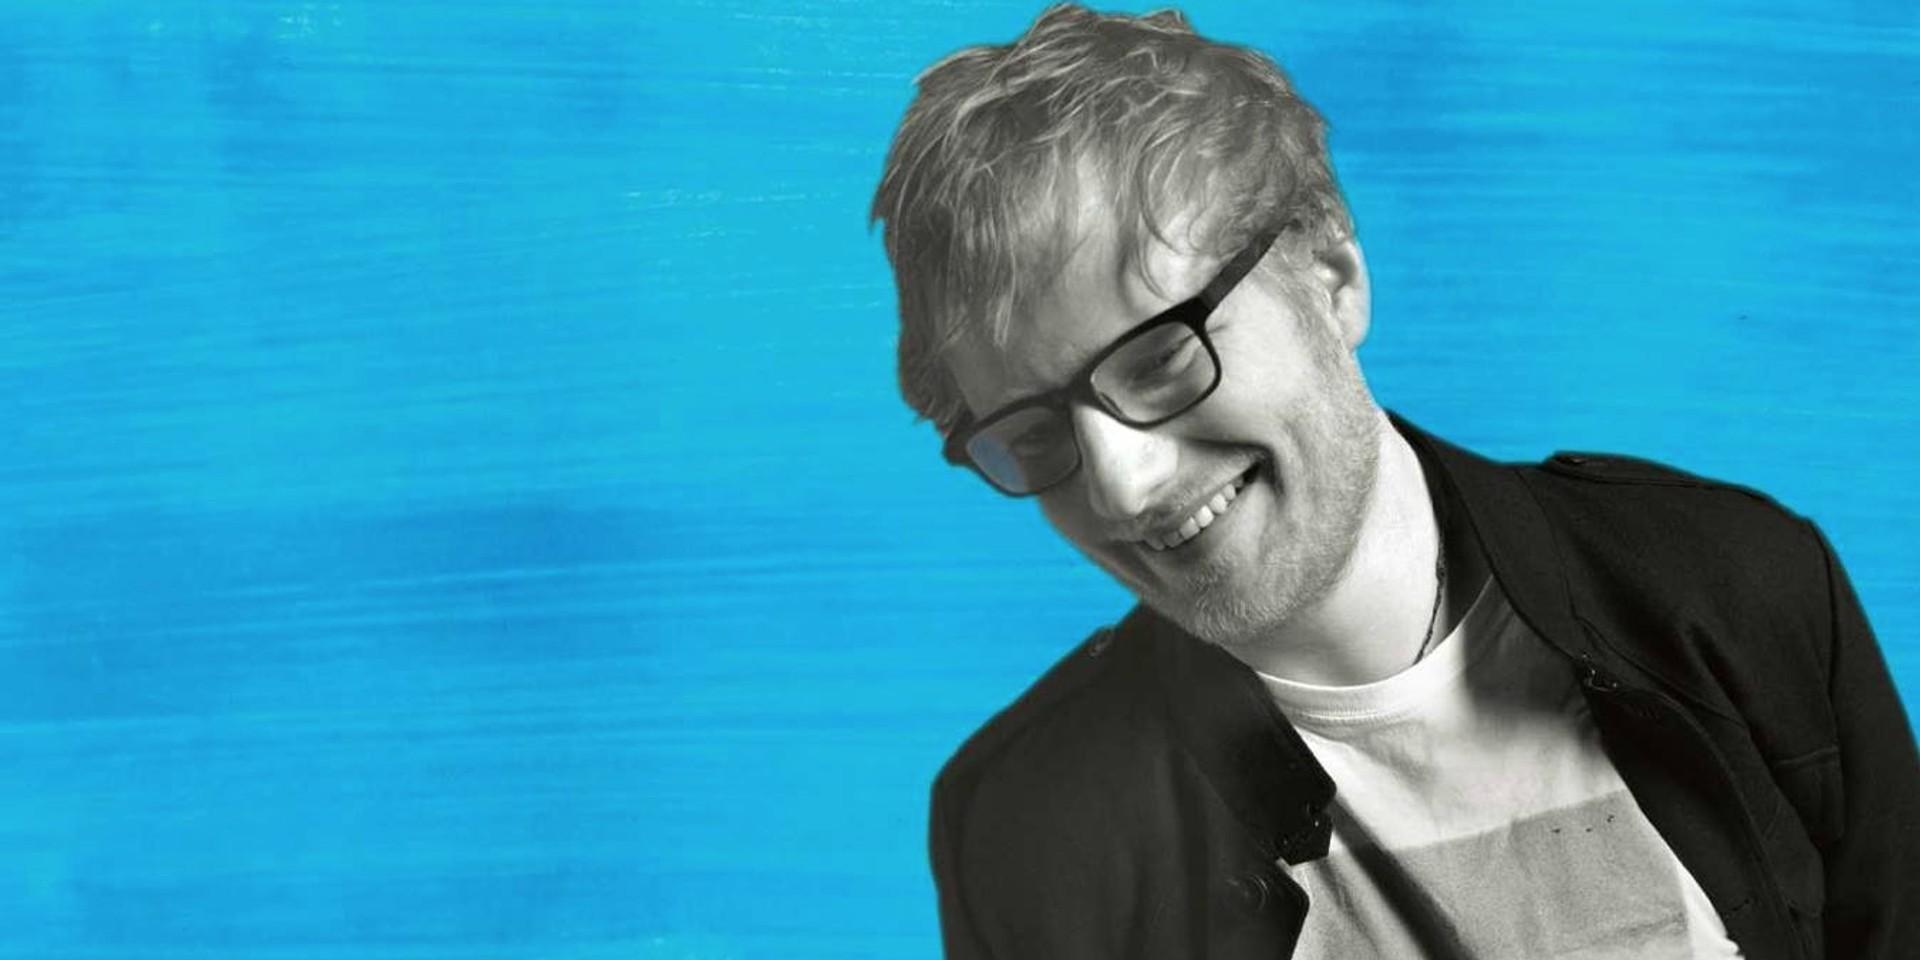 No, Sports Hub staff did not illegally sell Ed Sheeran tickets